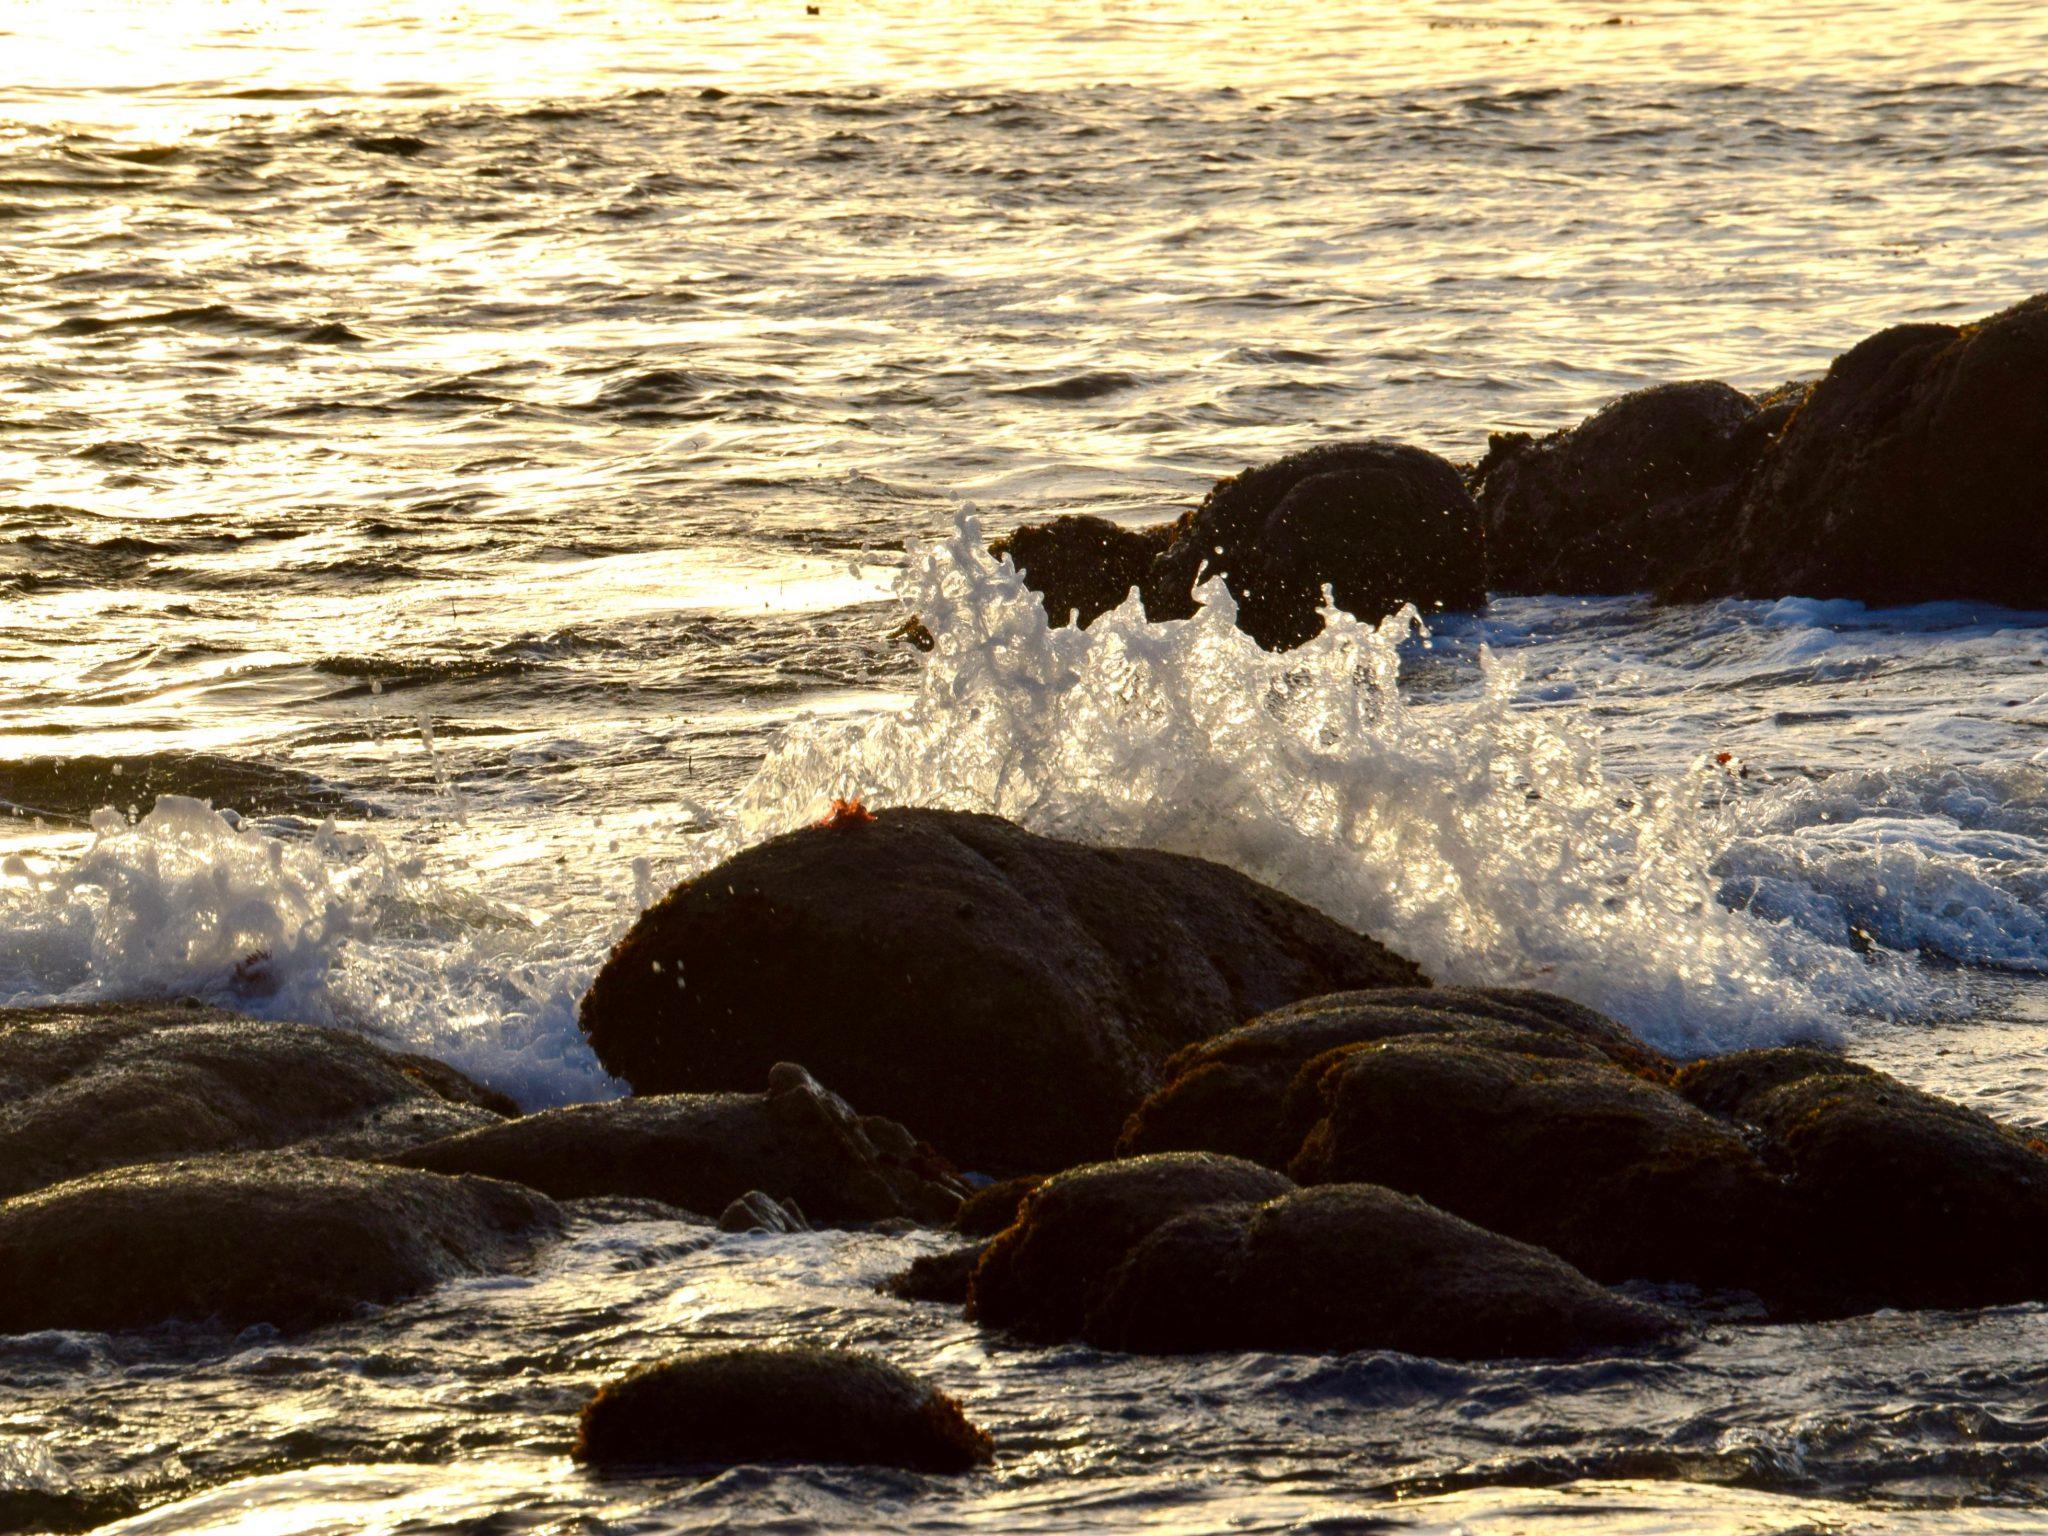 waves splash on rocks at Cannery Row, Monterey, California